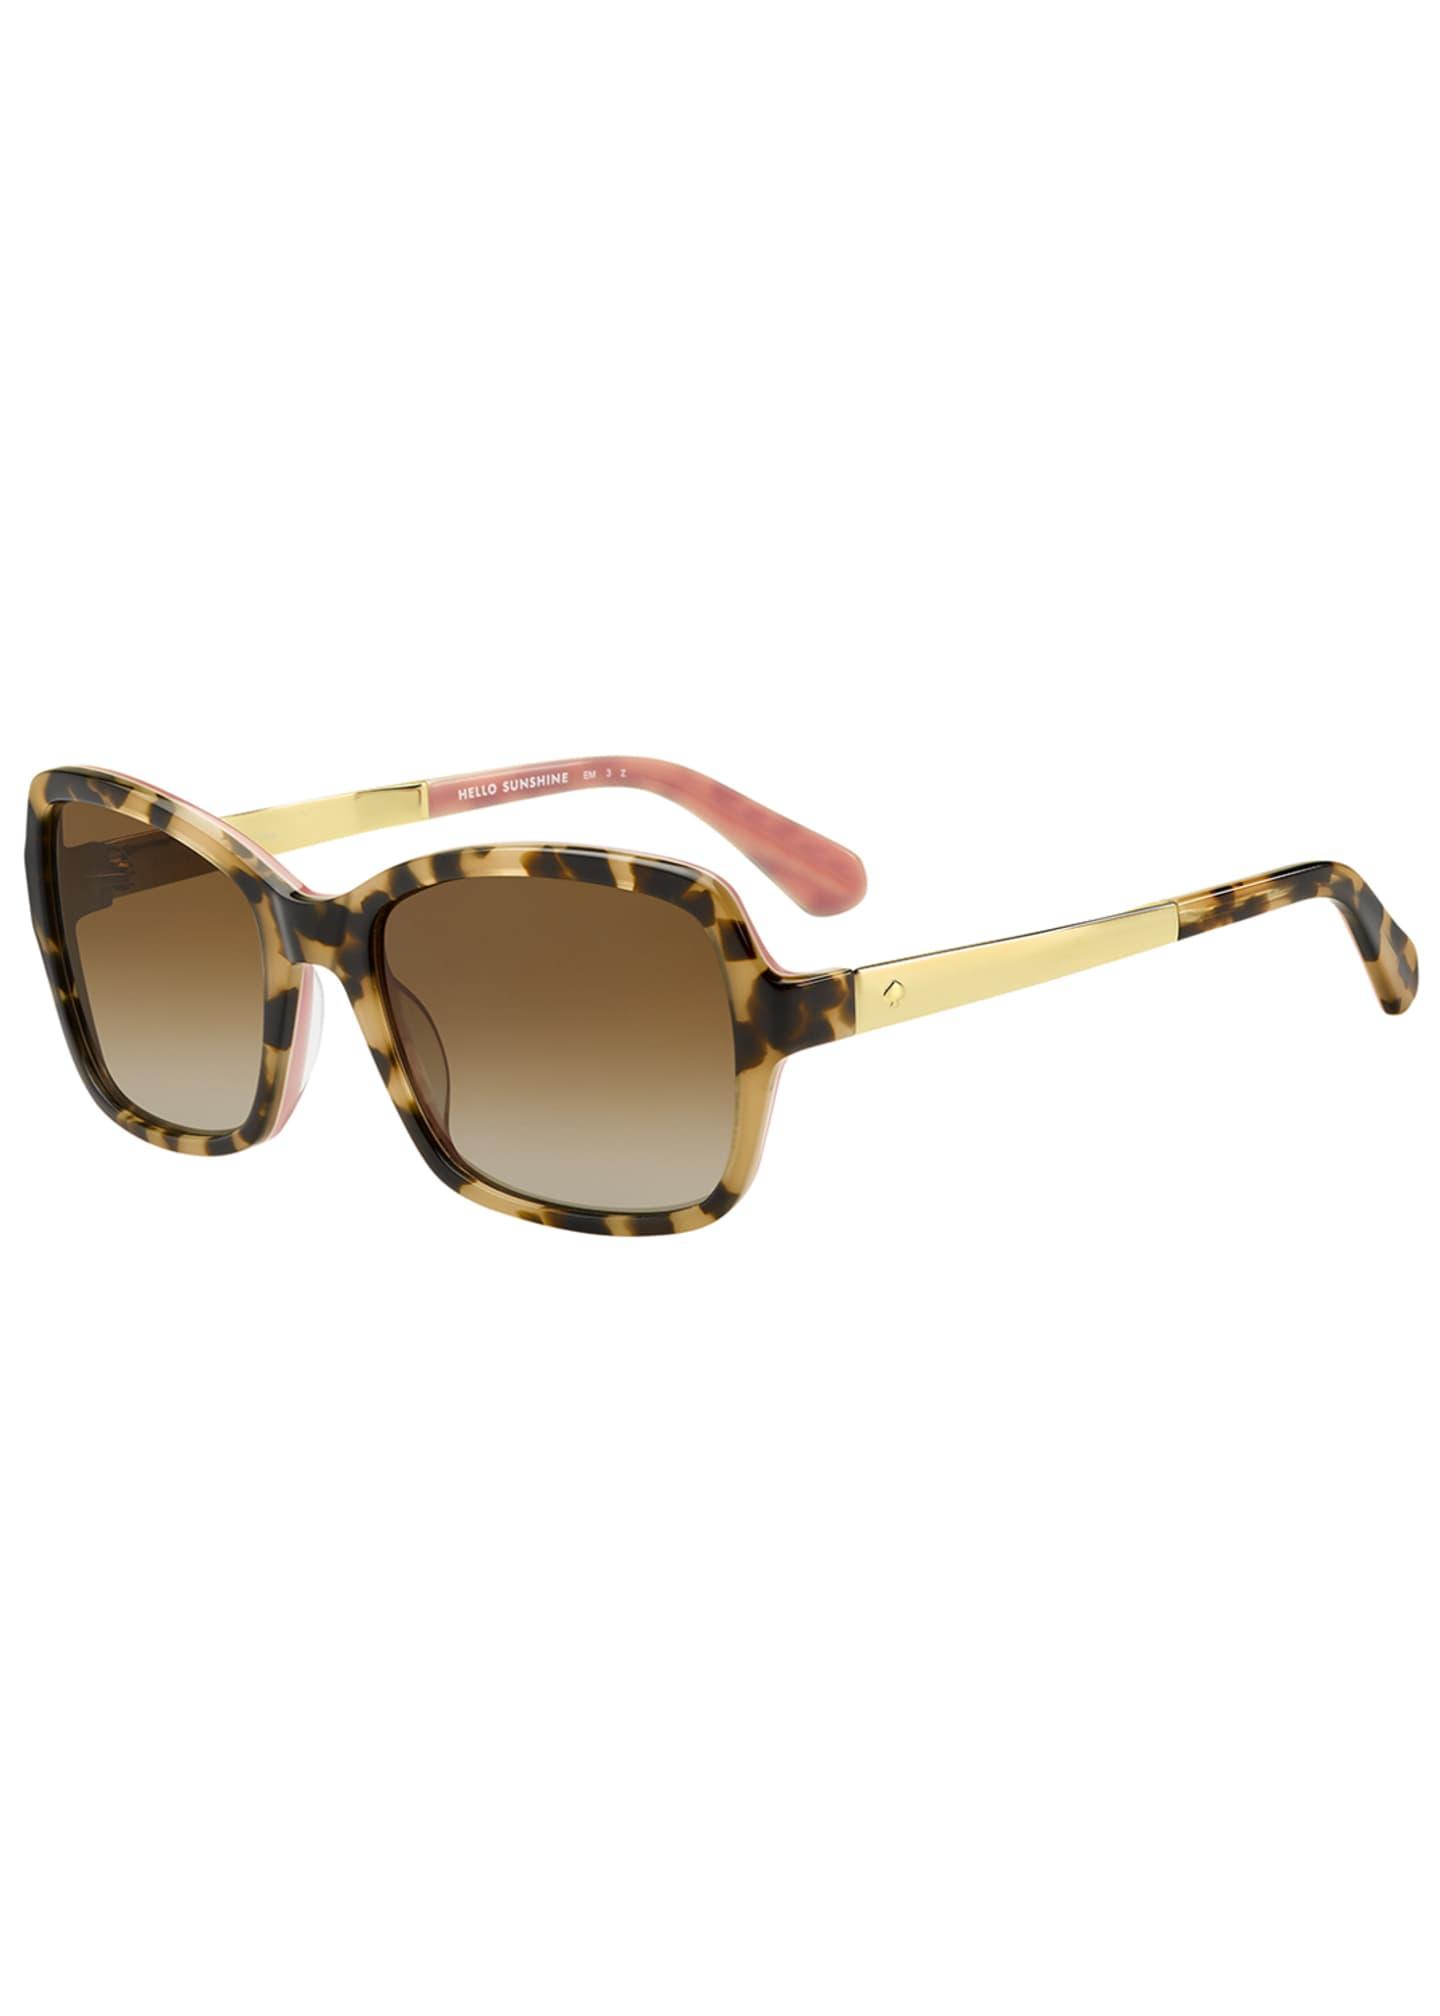 kate spade new york annjanette square sunglasses